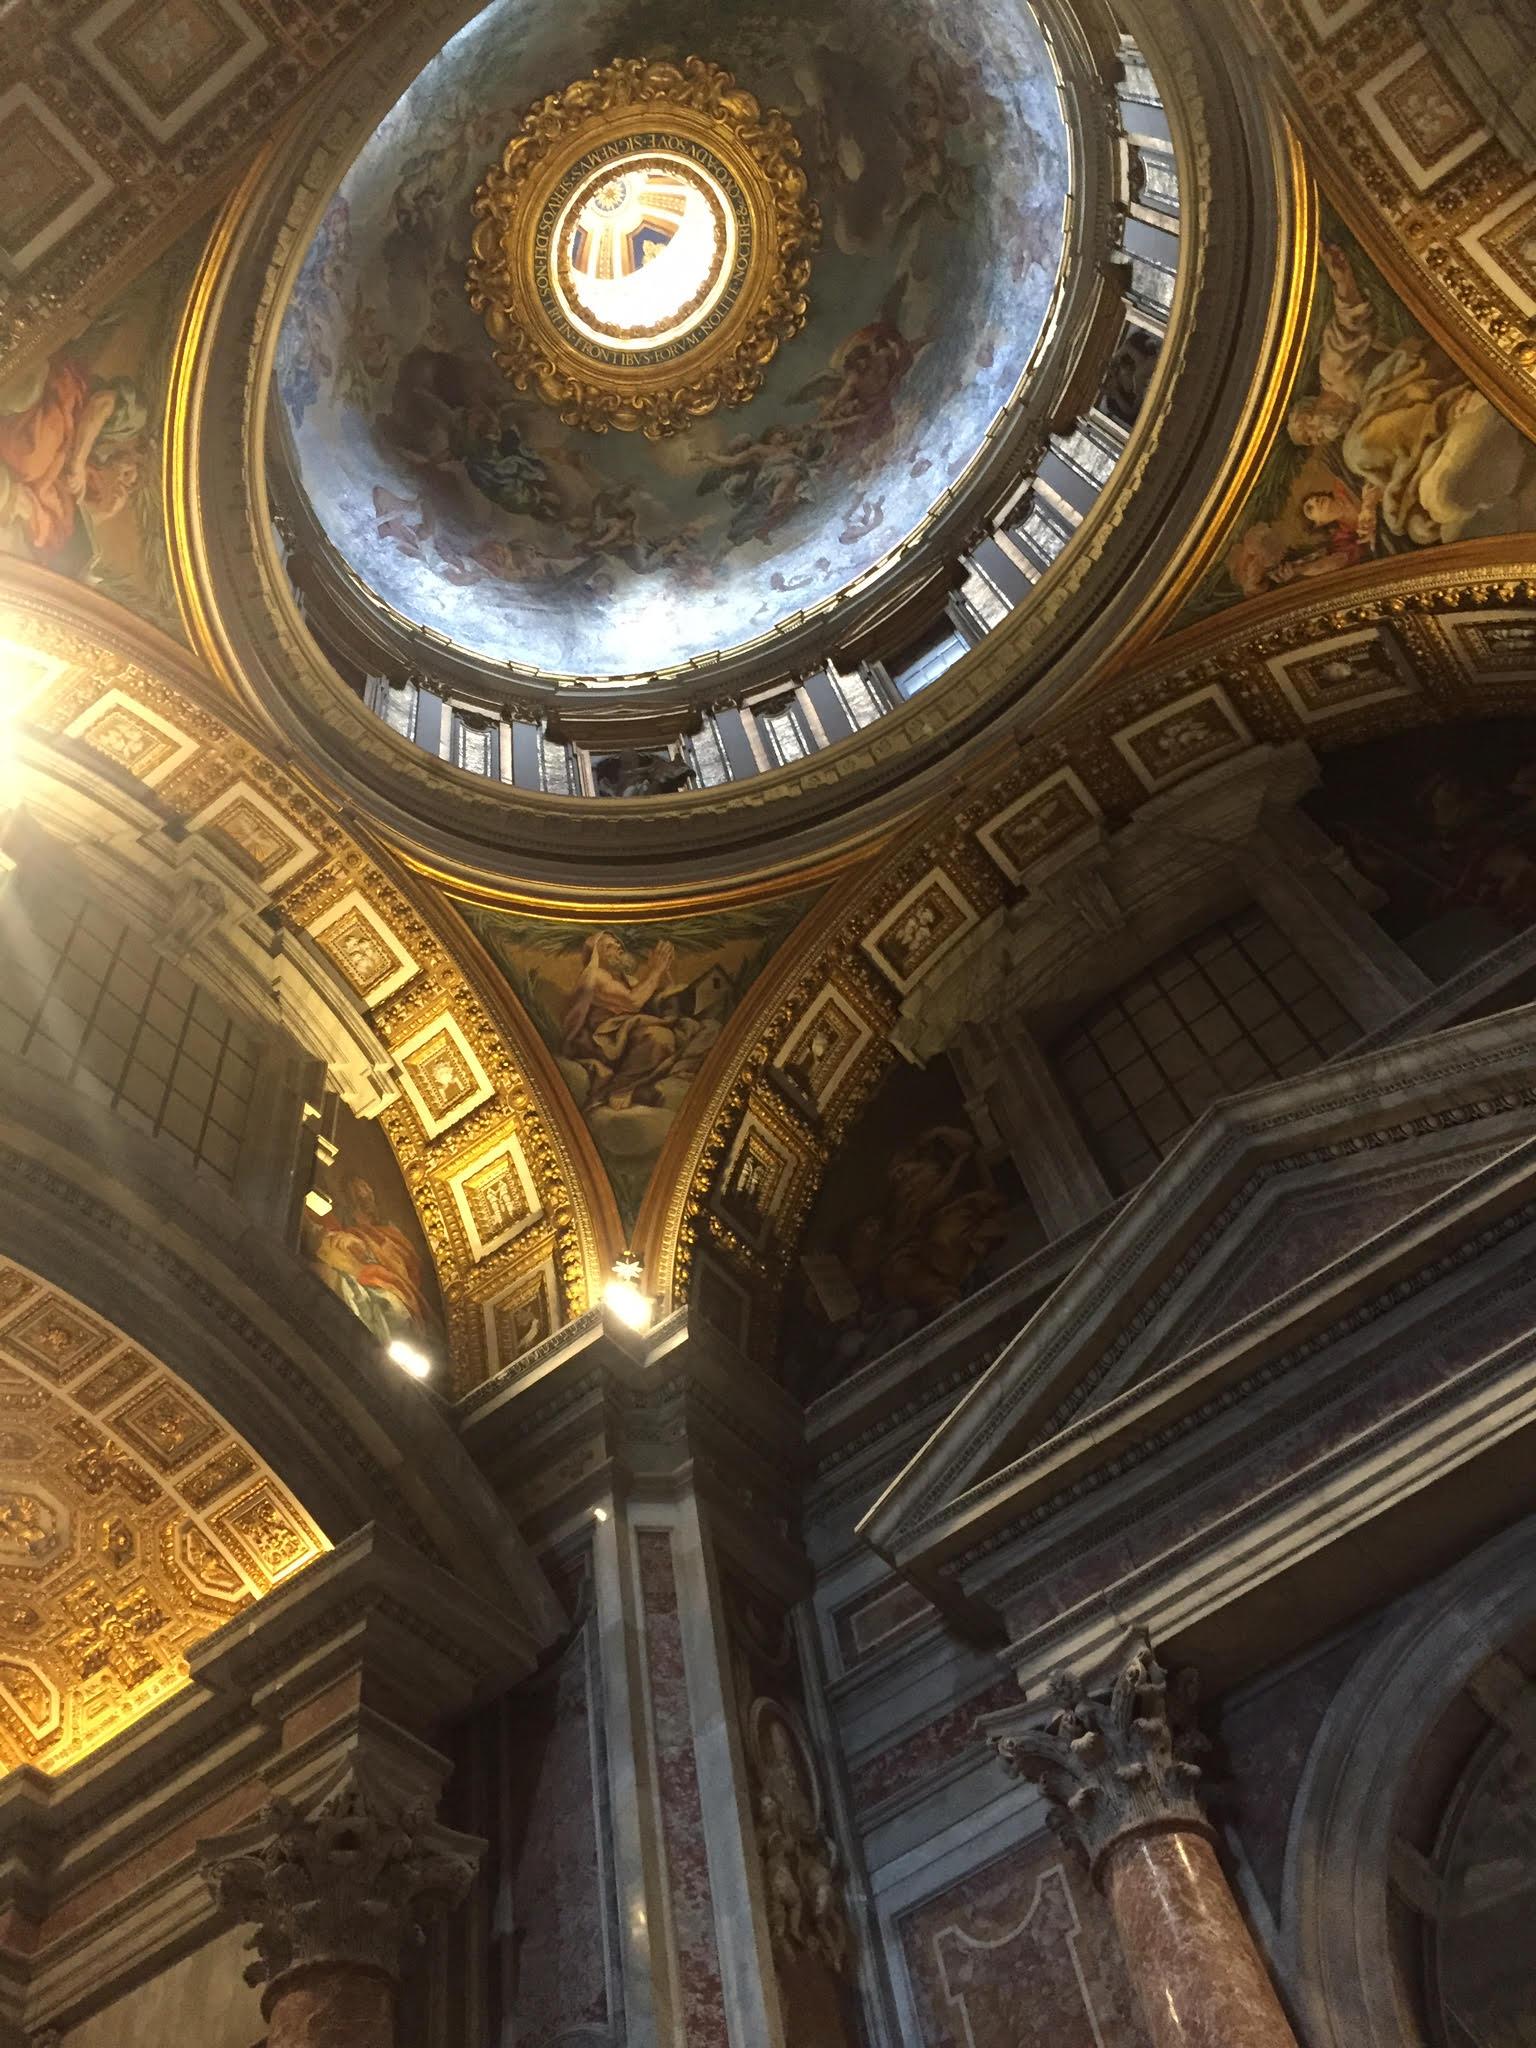 Three Days in Rome: An Update